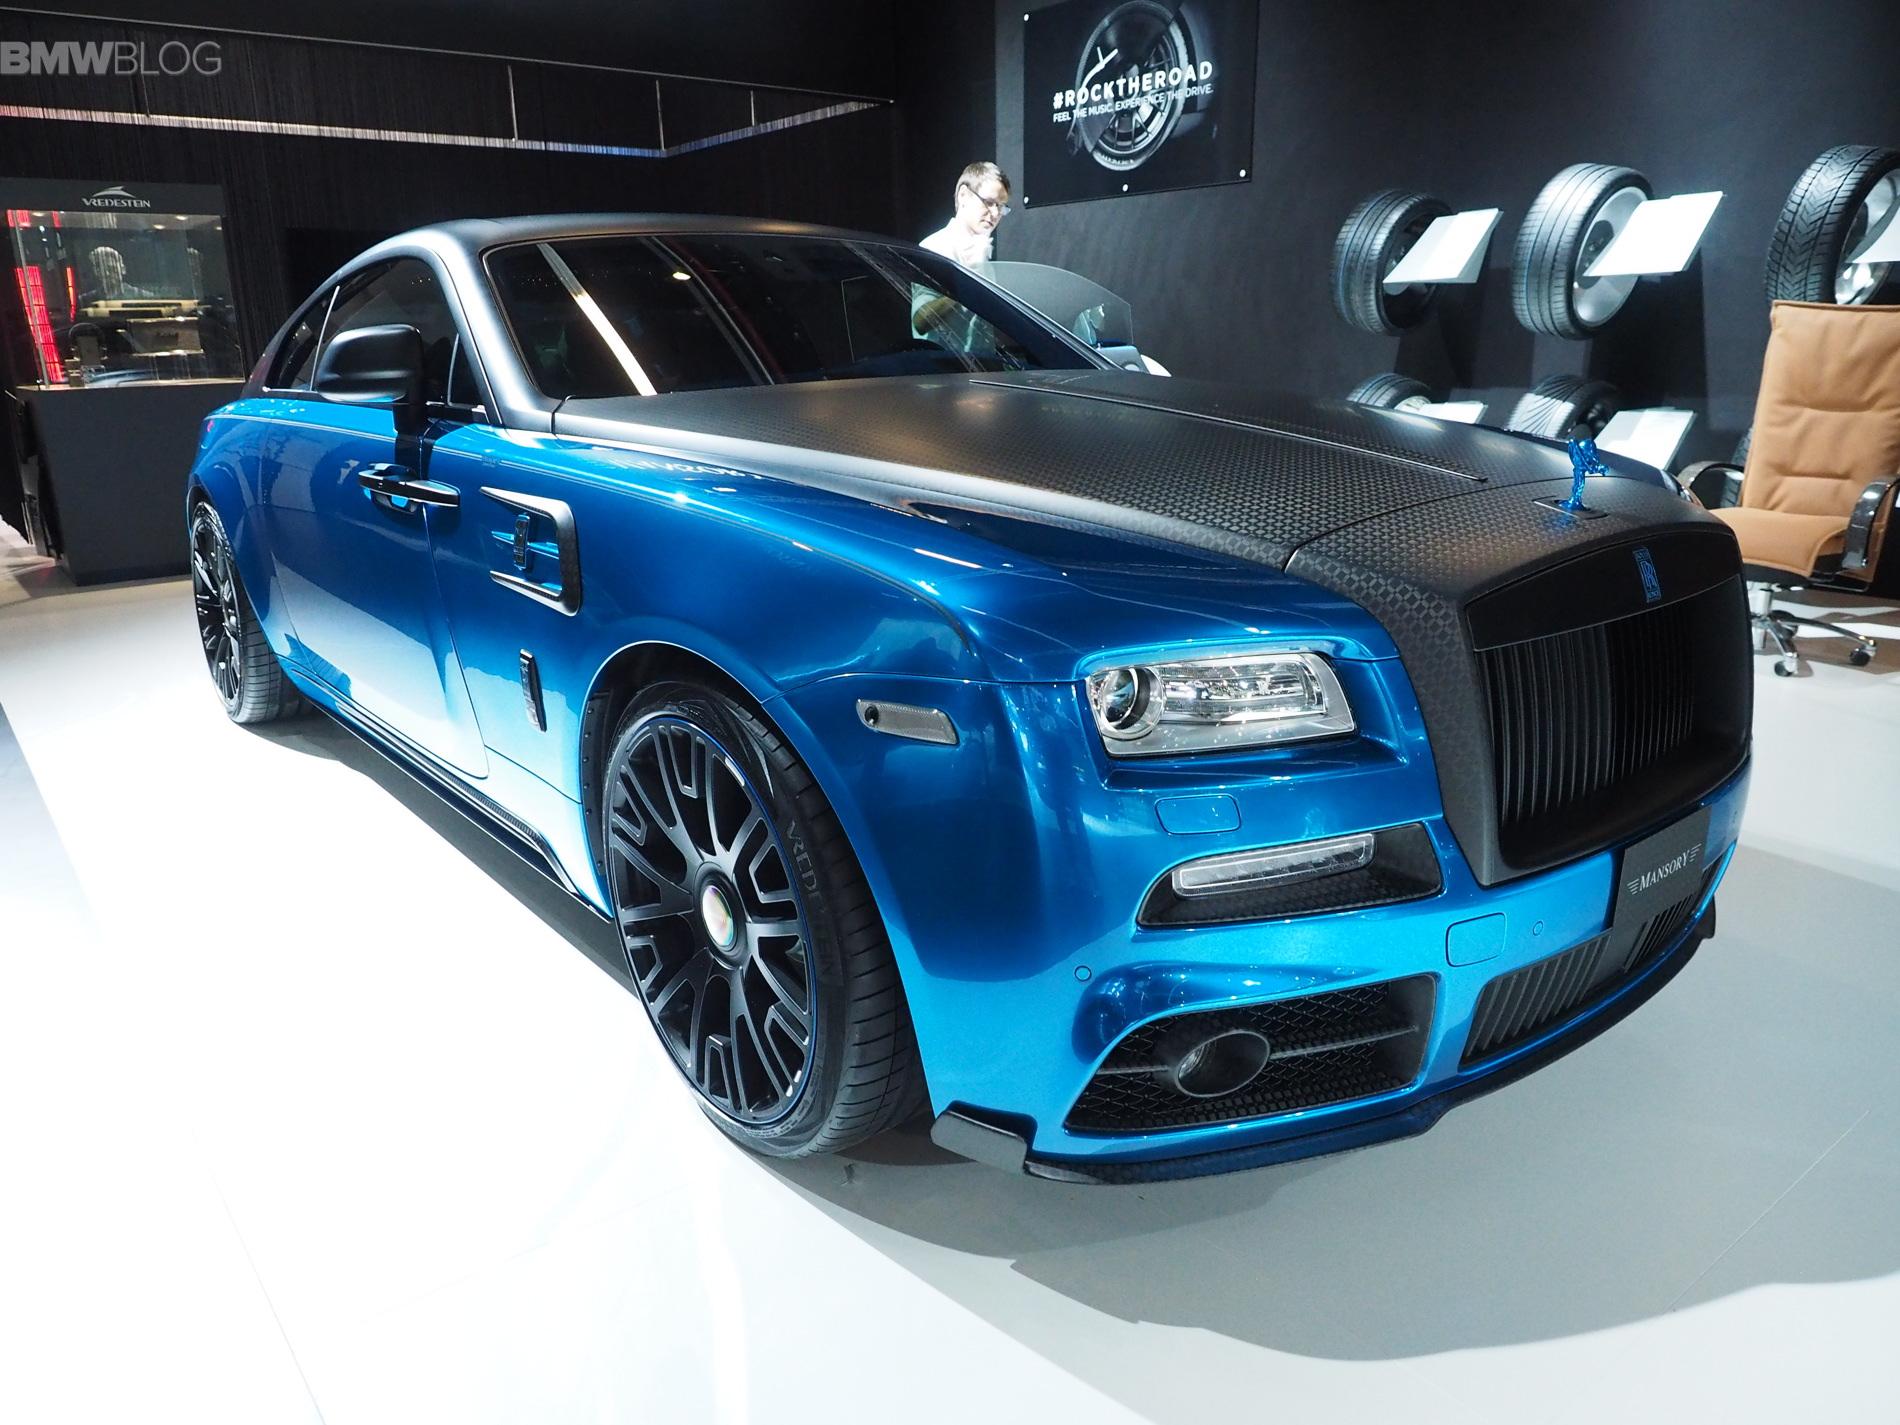 Mansory Rolls Royce Frankfurt images 01